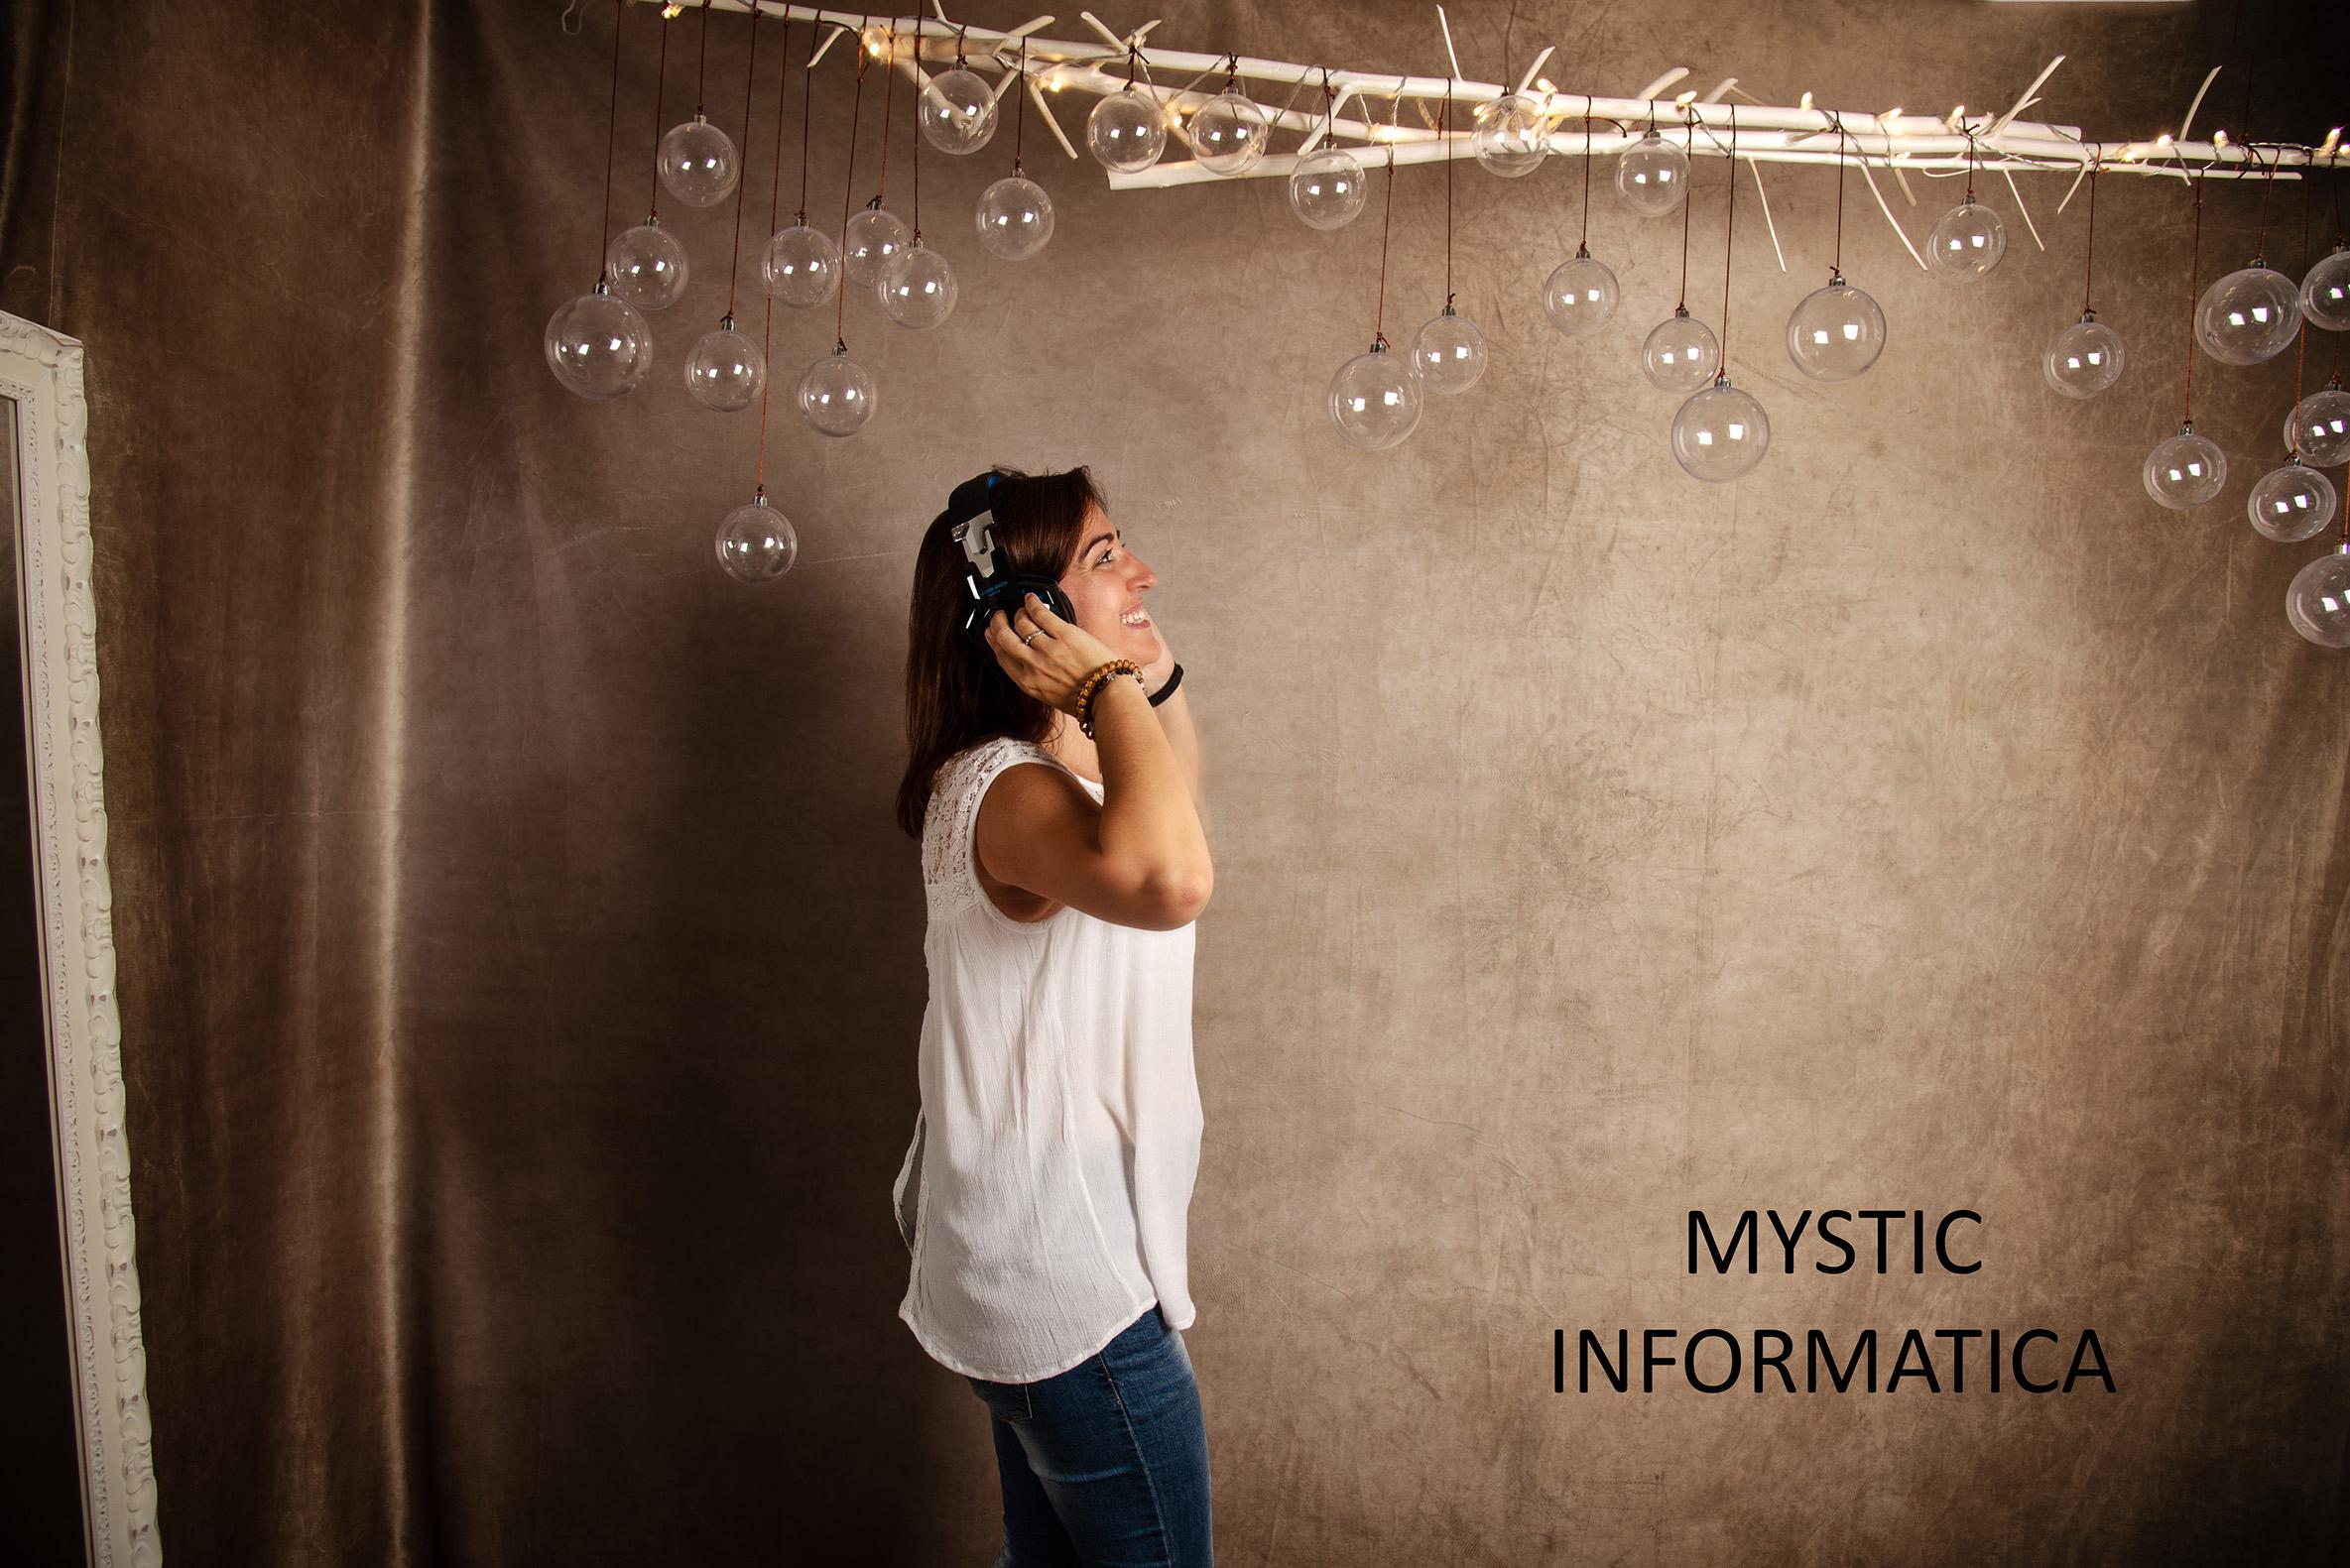 Mystic Informatica